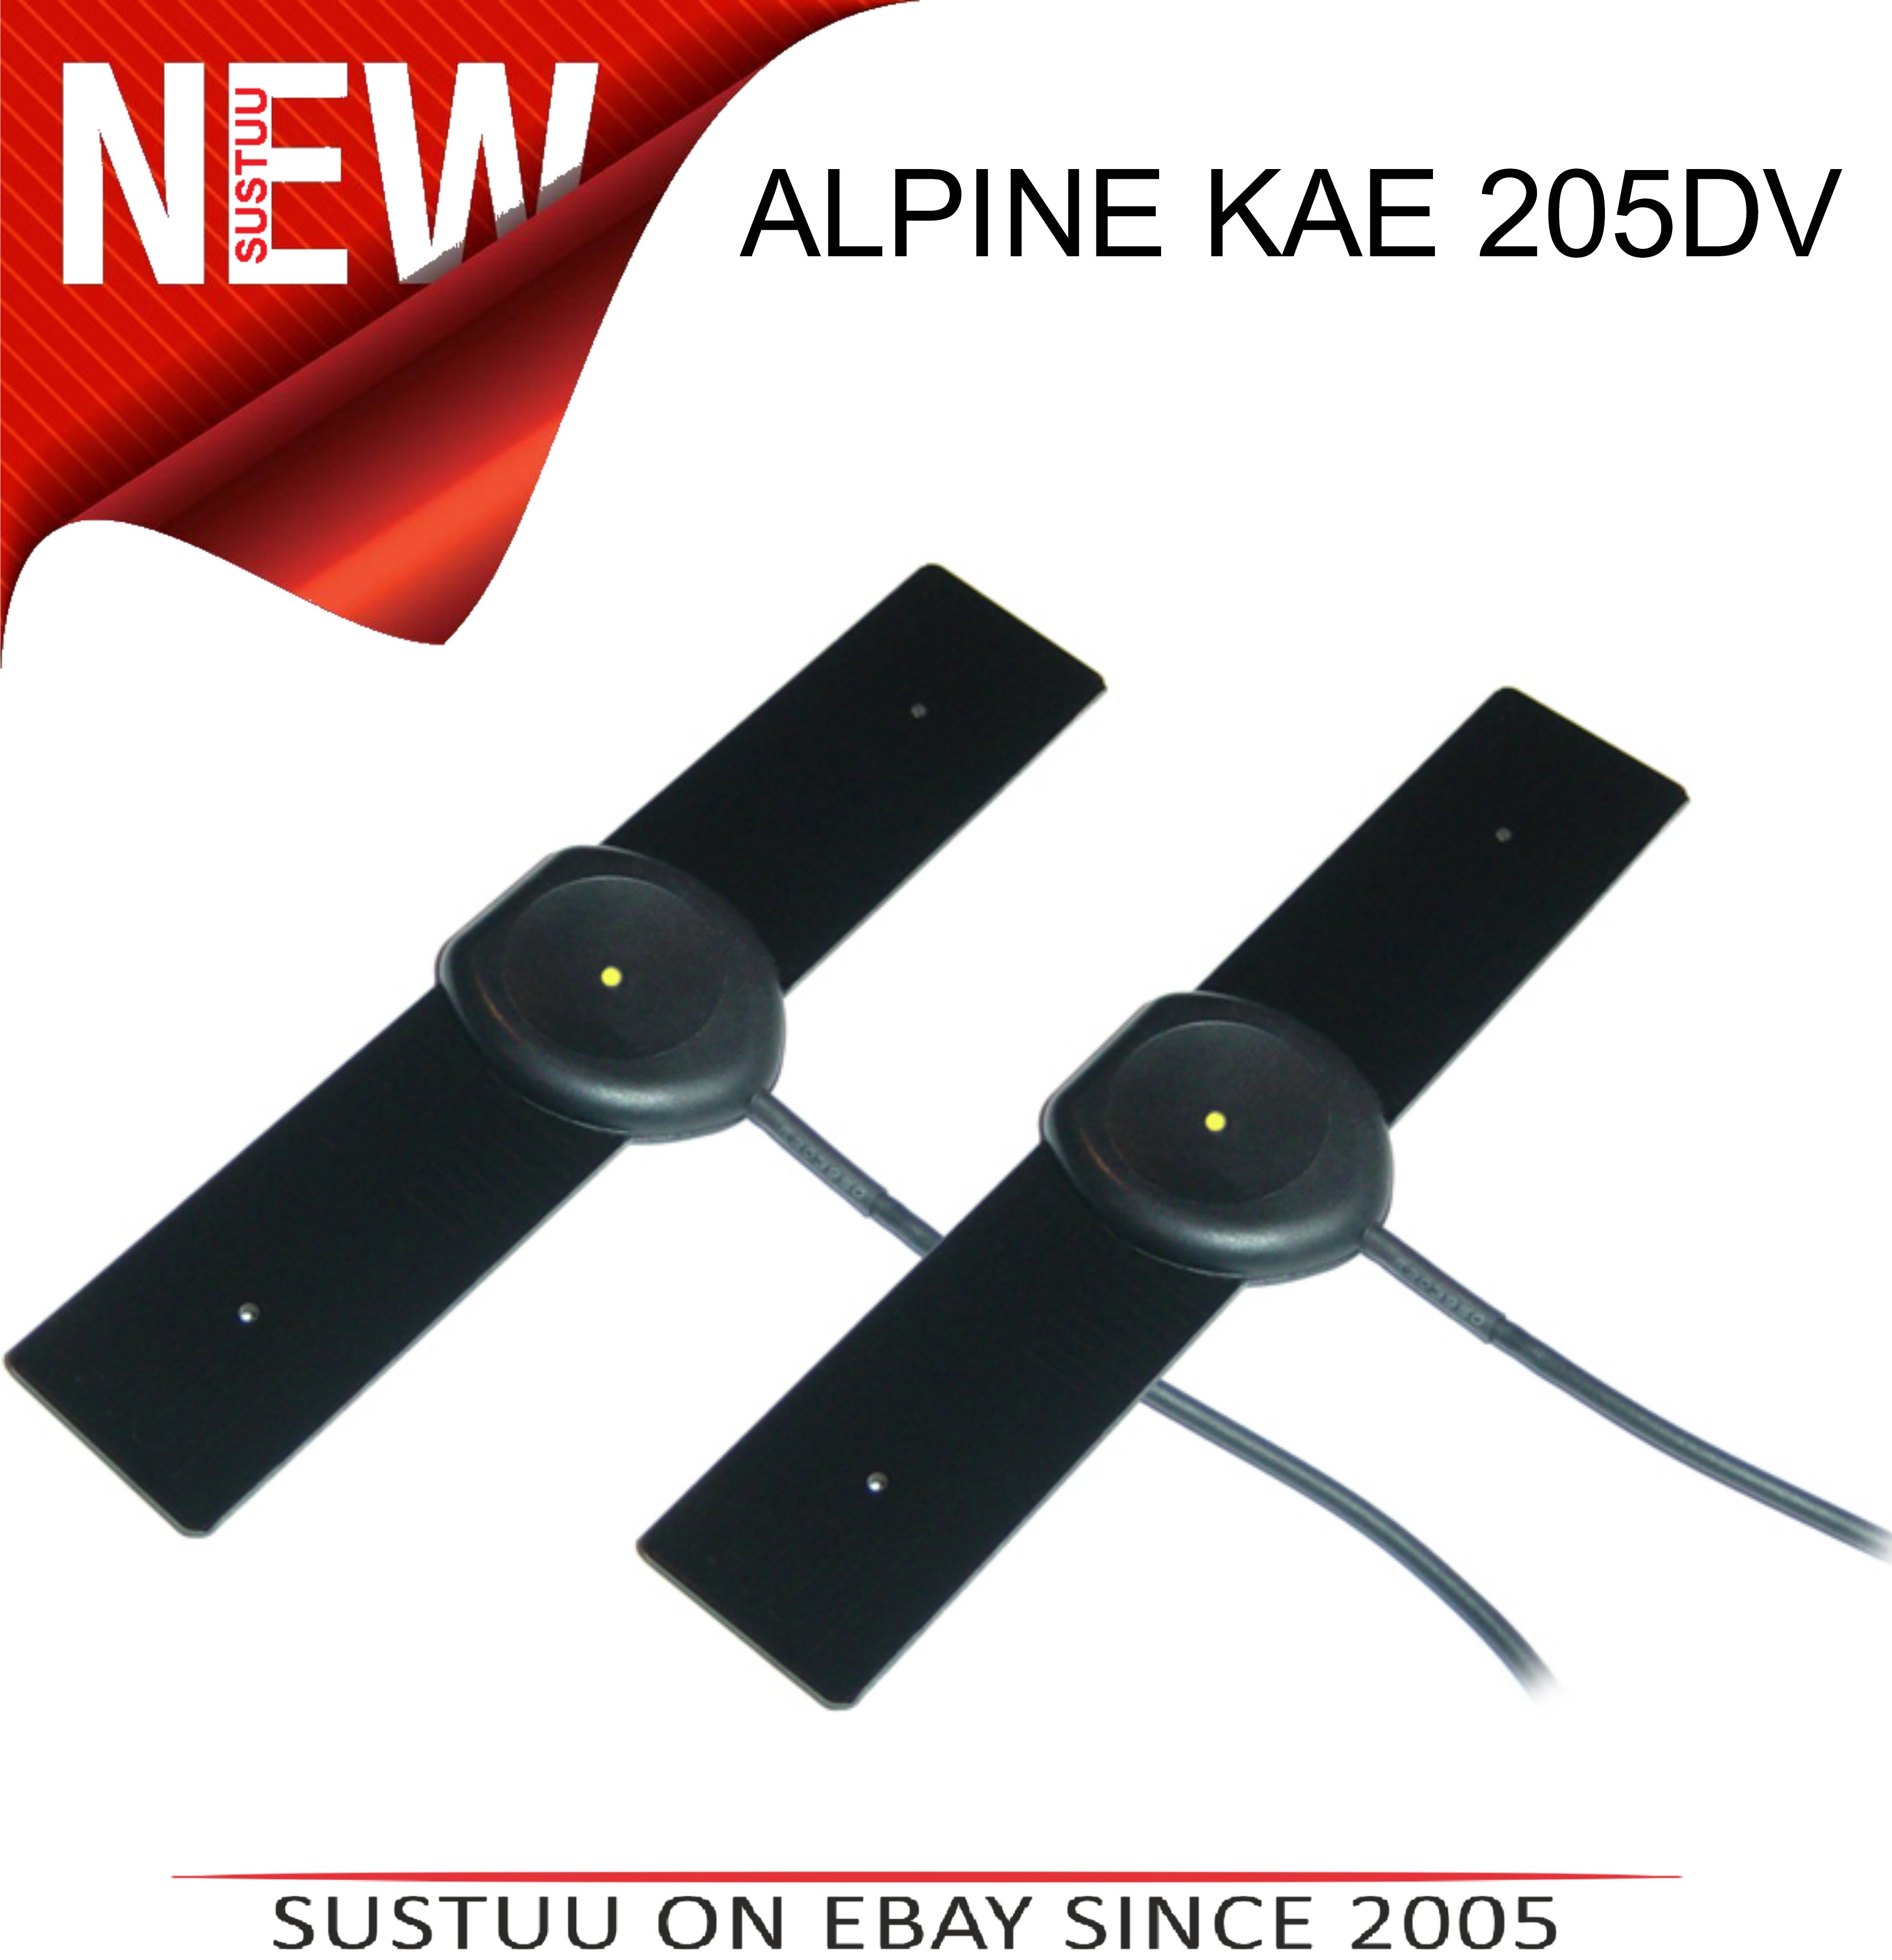 ALPINE KAE 205DV Aerial for Digital T/V  (TUE-T150/200)